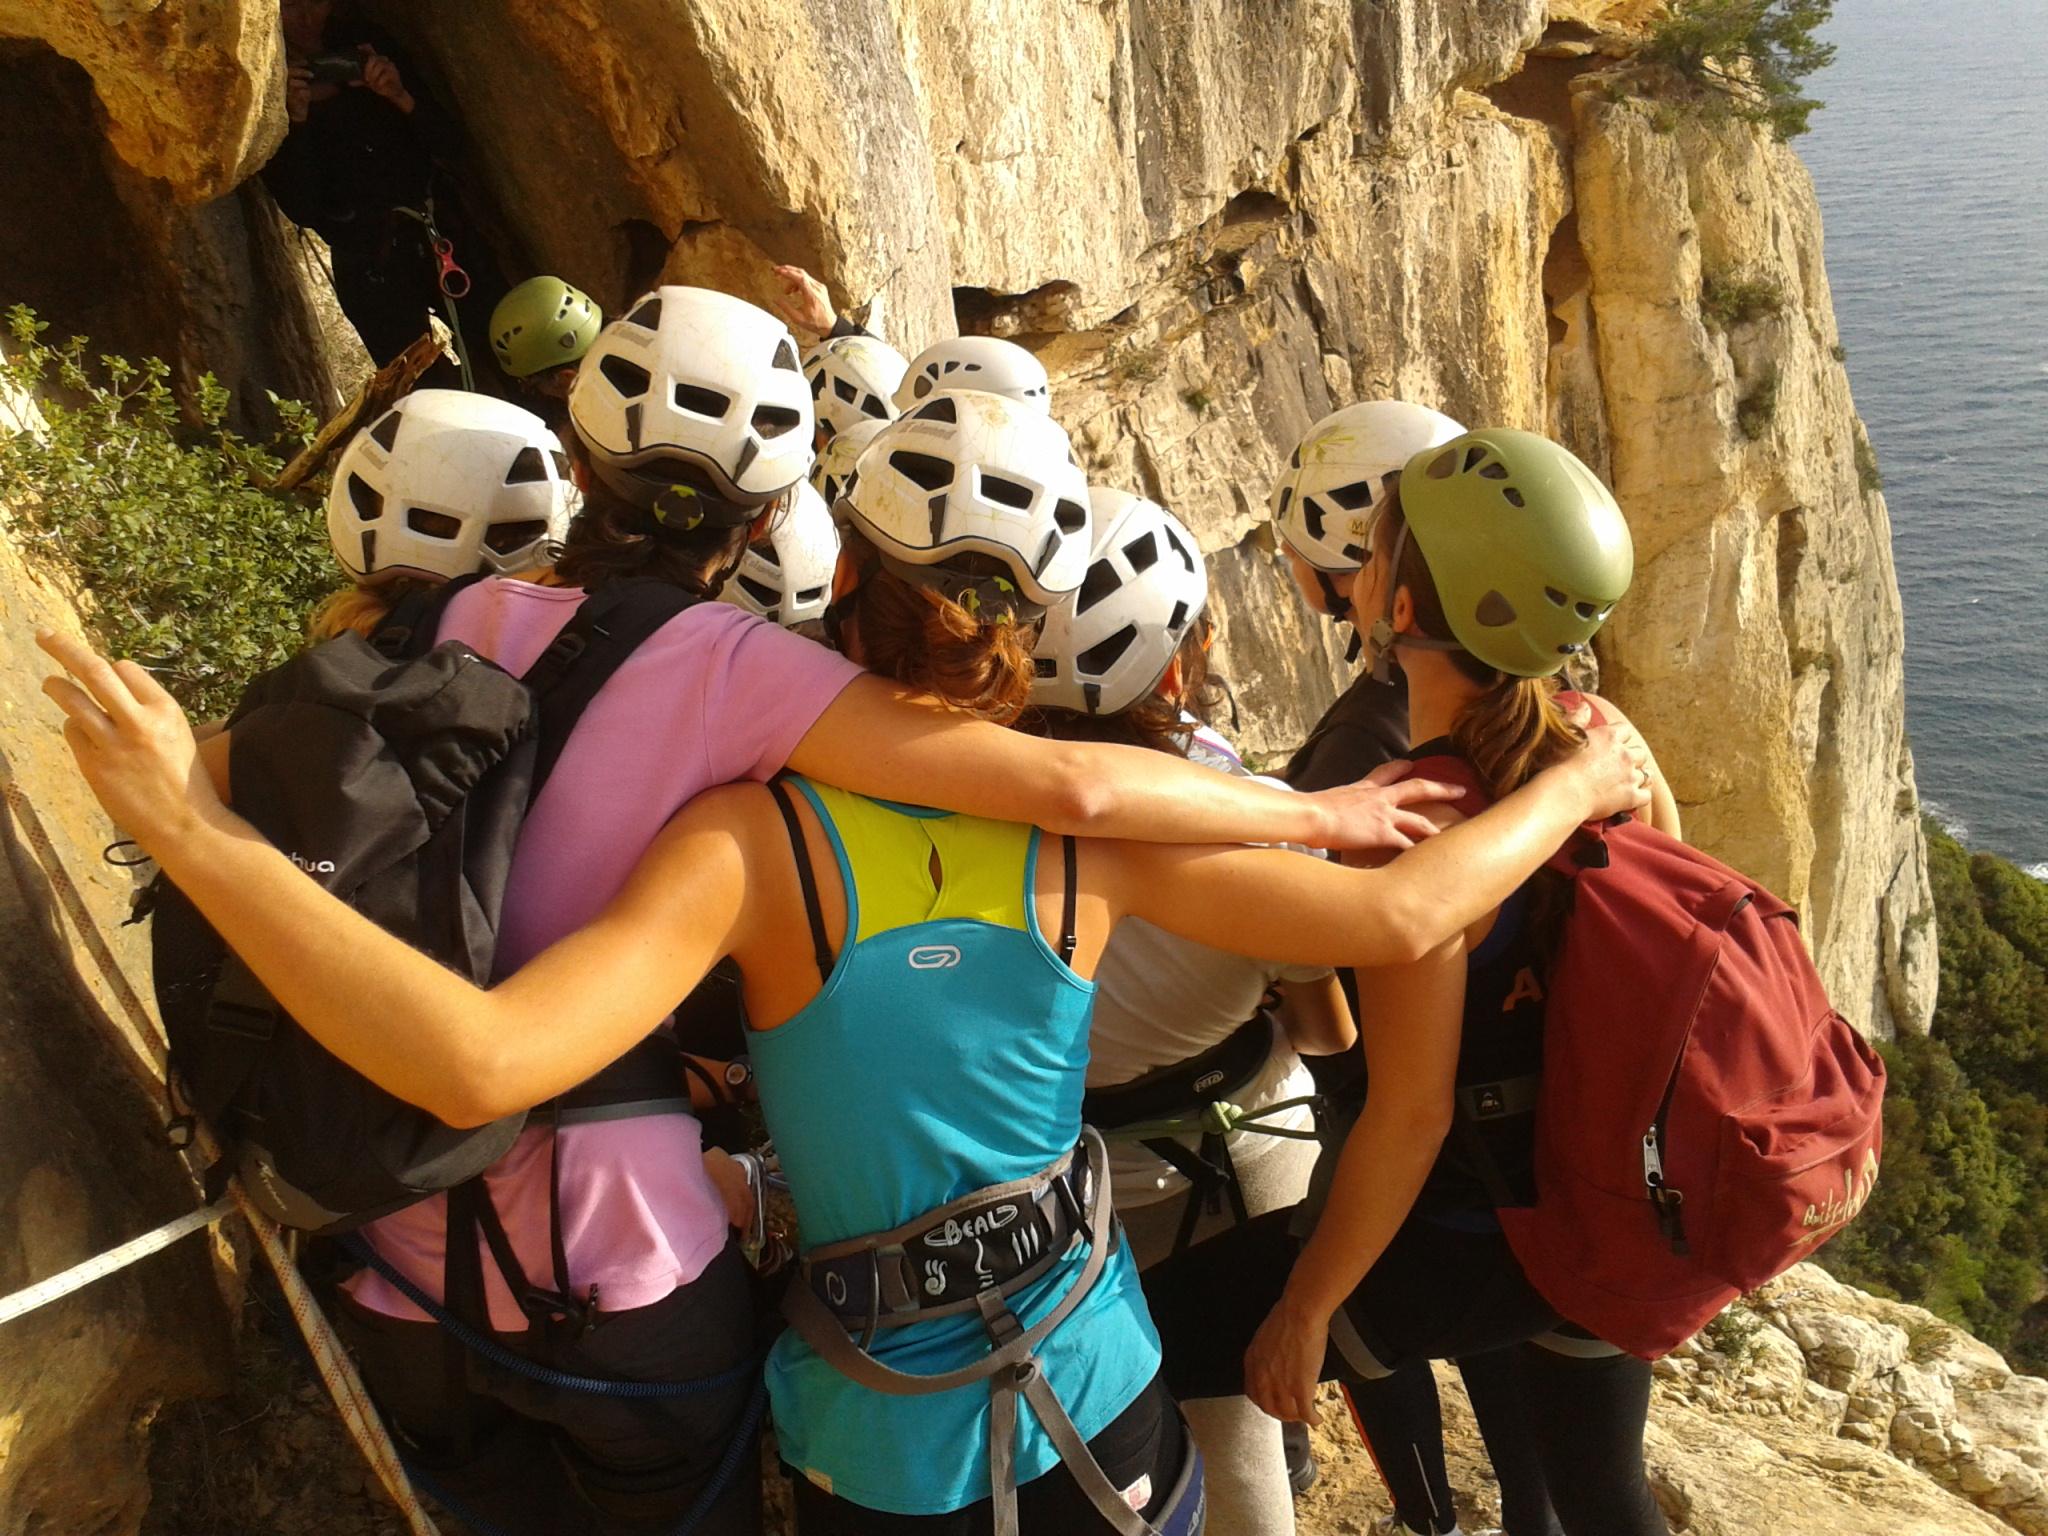 parcours aventure canaille escalade calanques cohesion